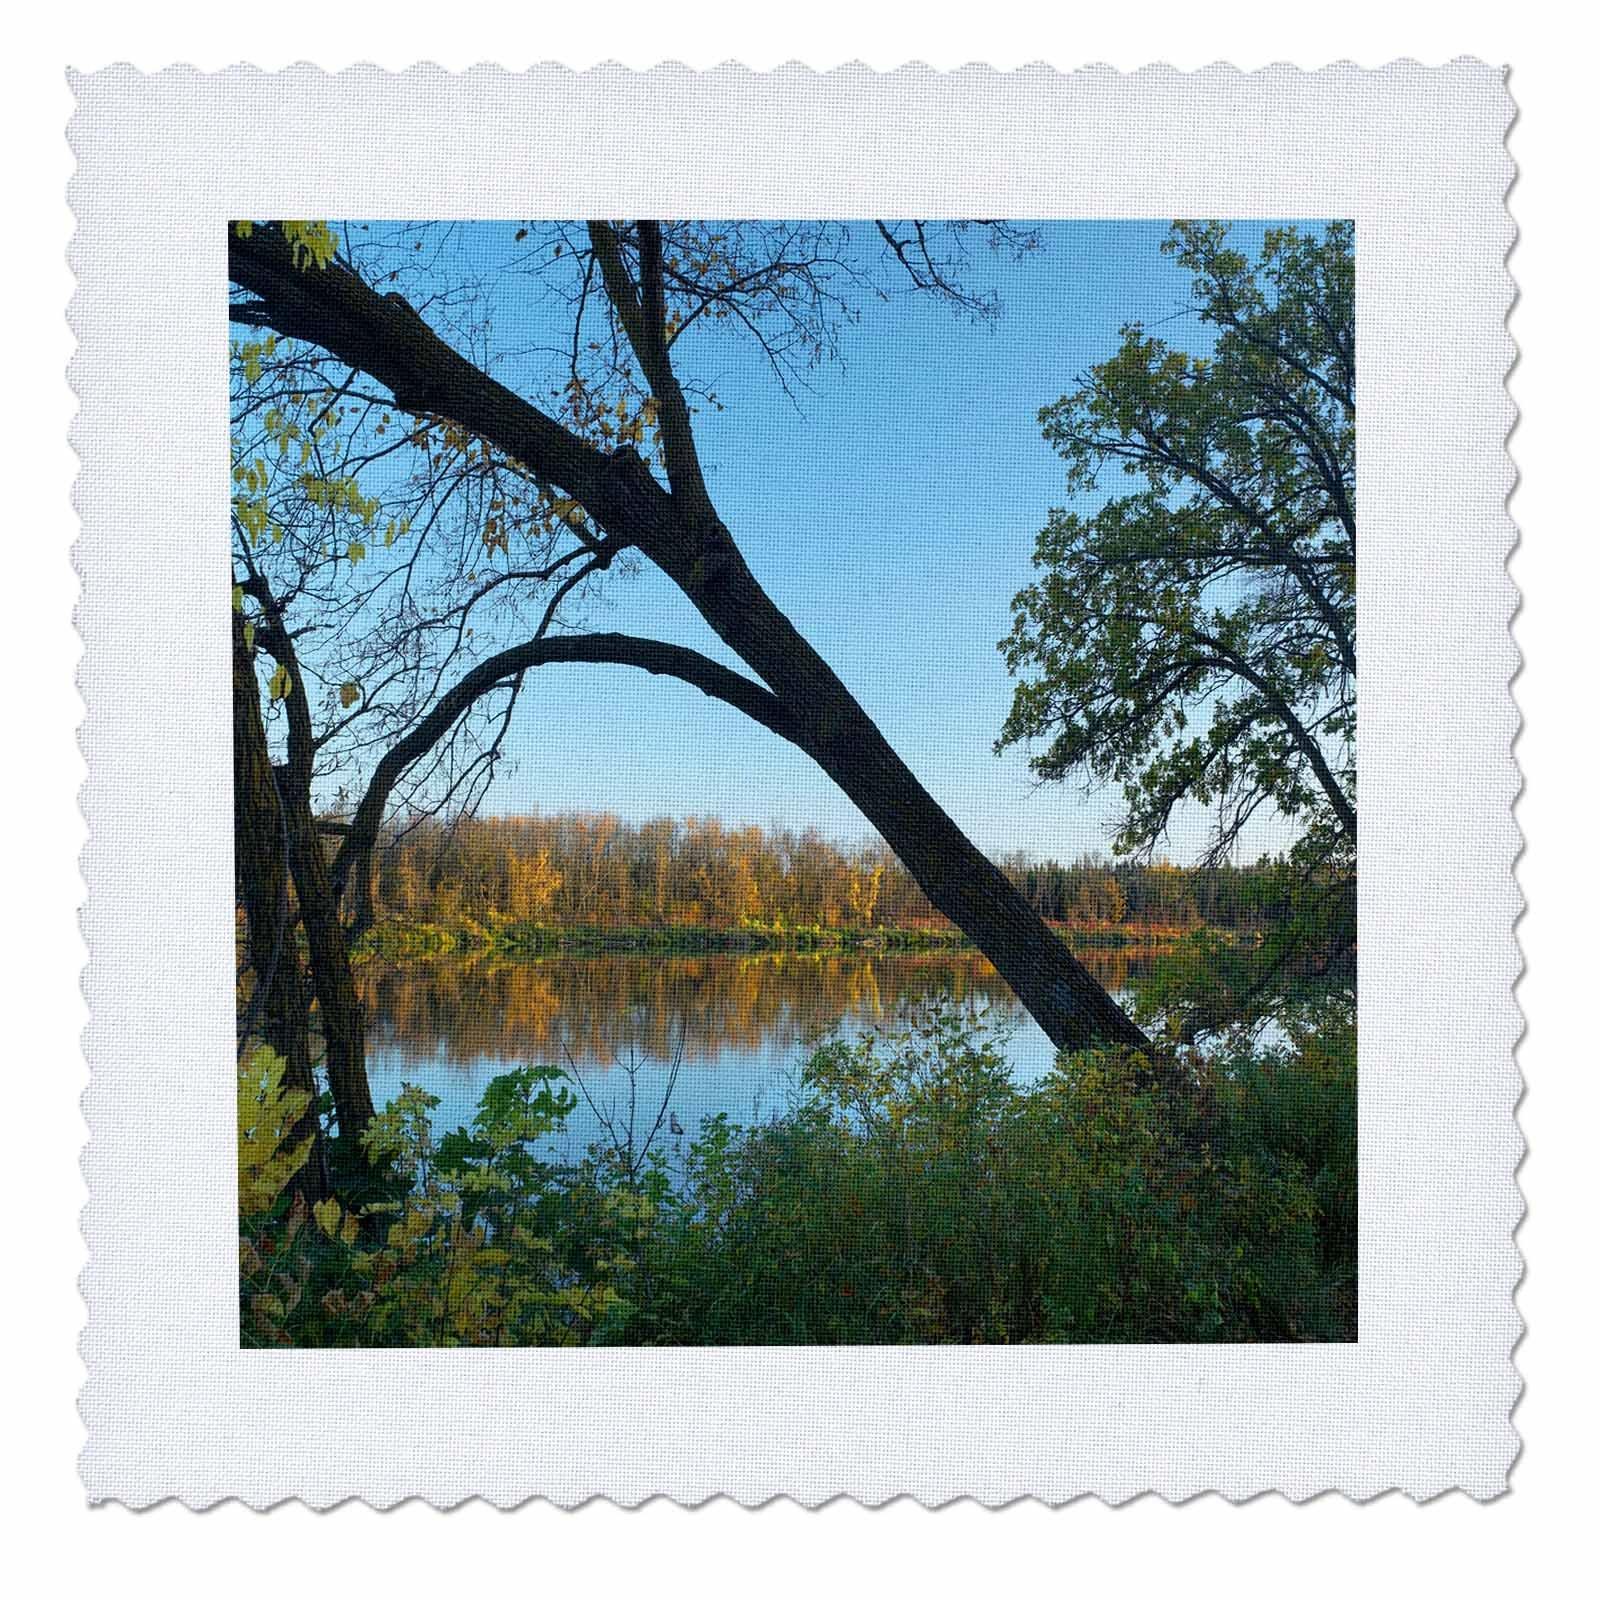 3dRose Danita Delimont - Lakes - Marshs Lake, Spruce Woods Provincial Park, Manitoba - 20x20 inch quilt square (qs_257516_8)